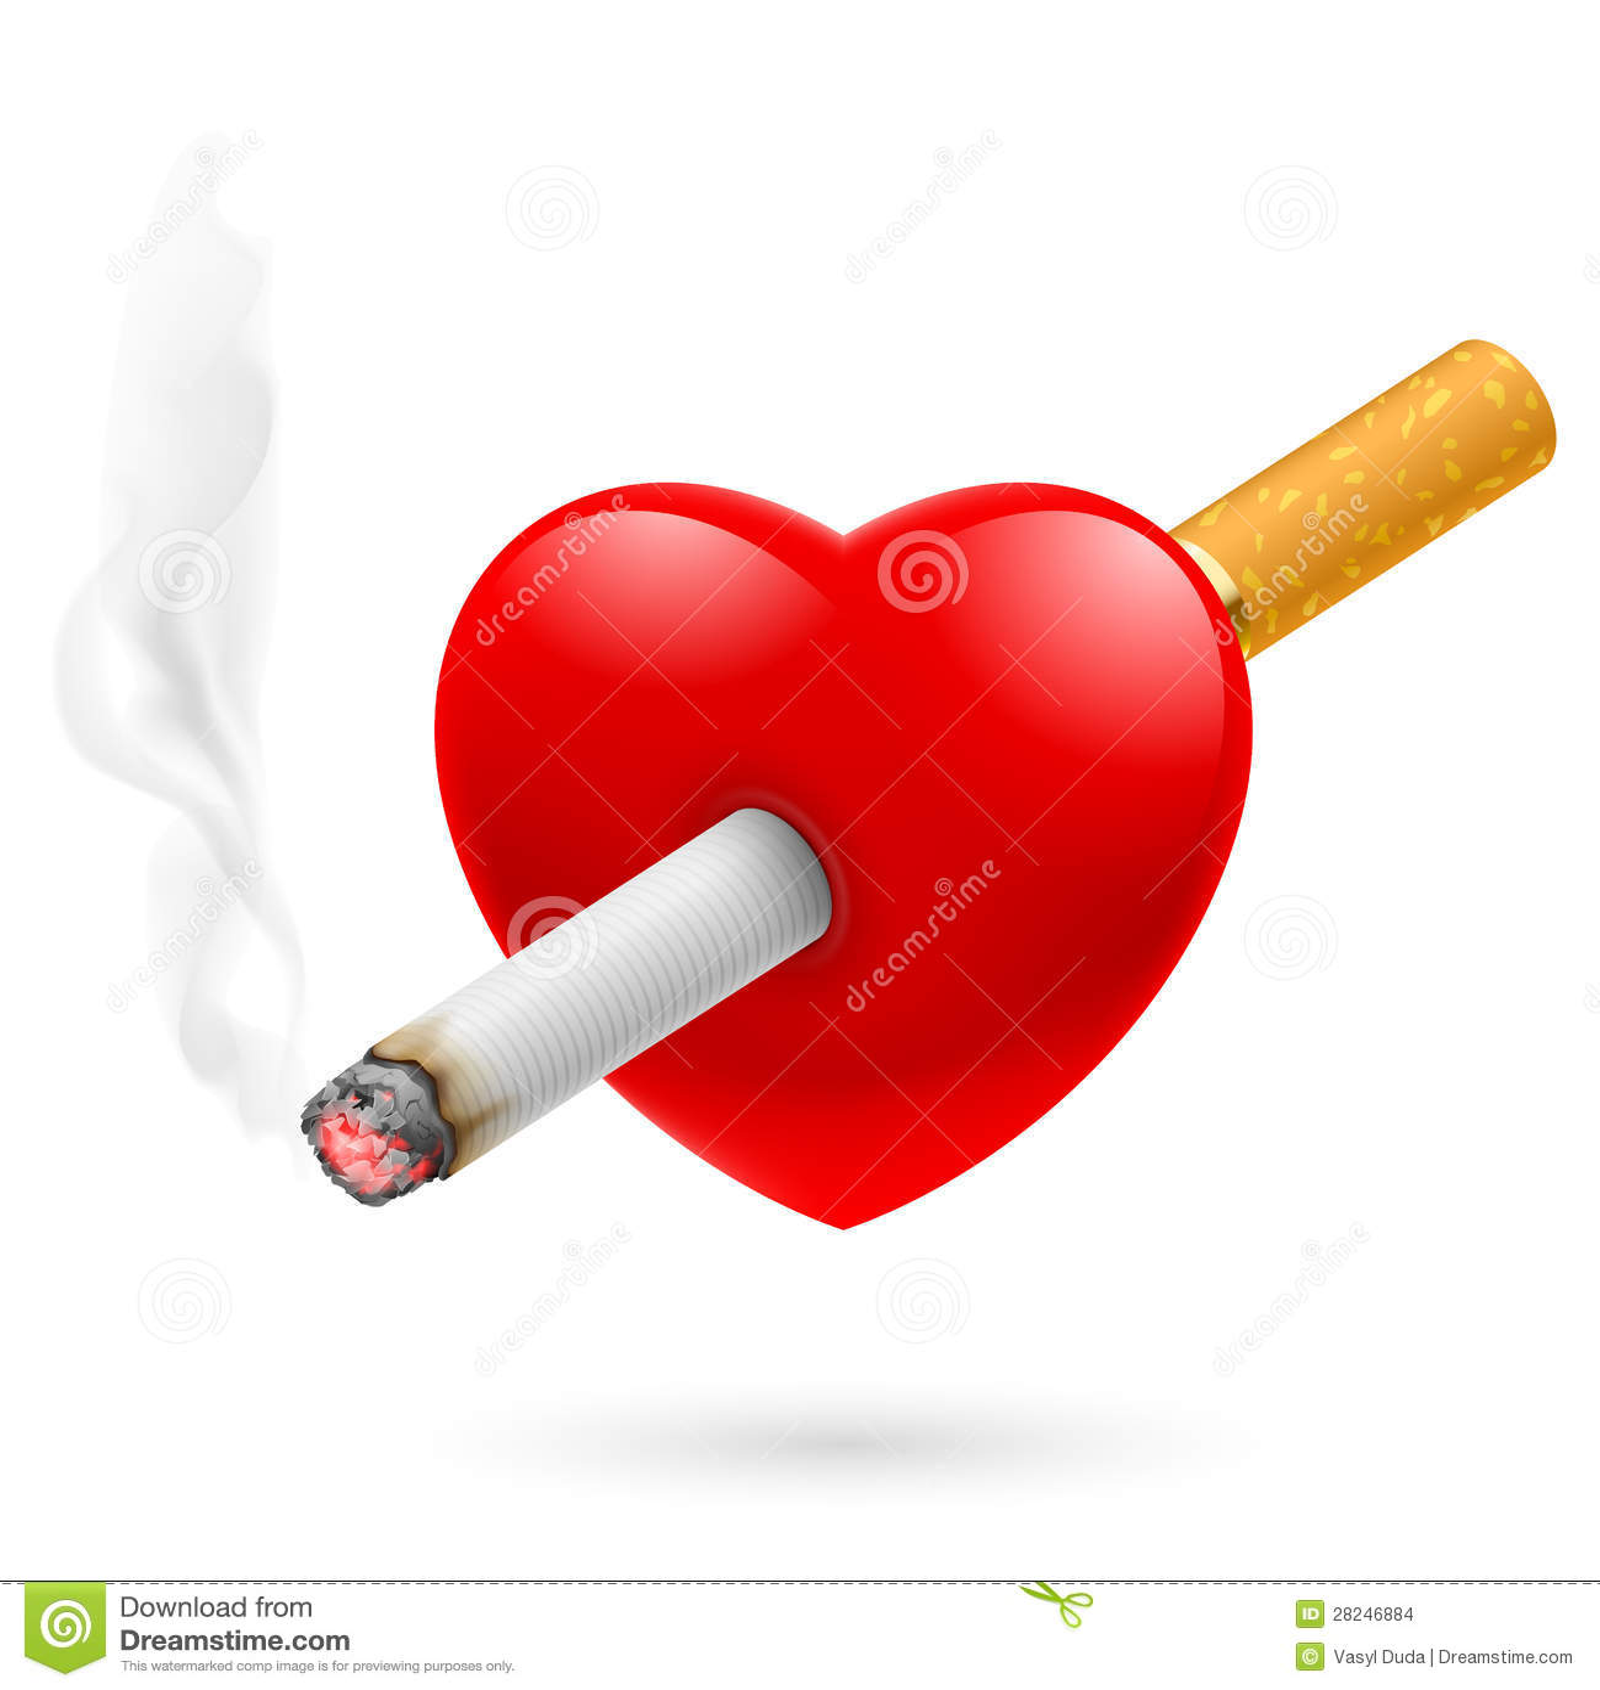 Smoking Kill Heart Stock Images - Image: 28246884